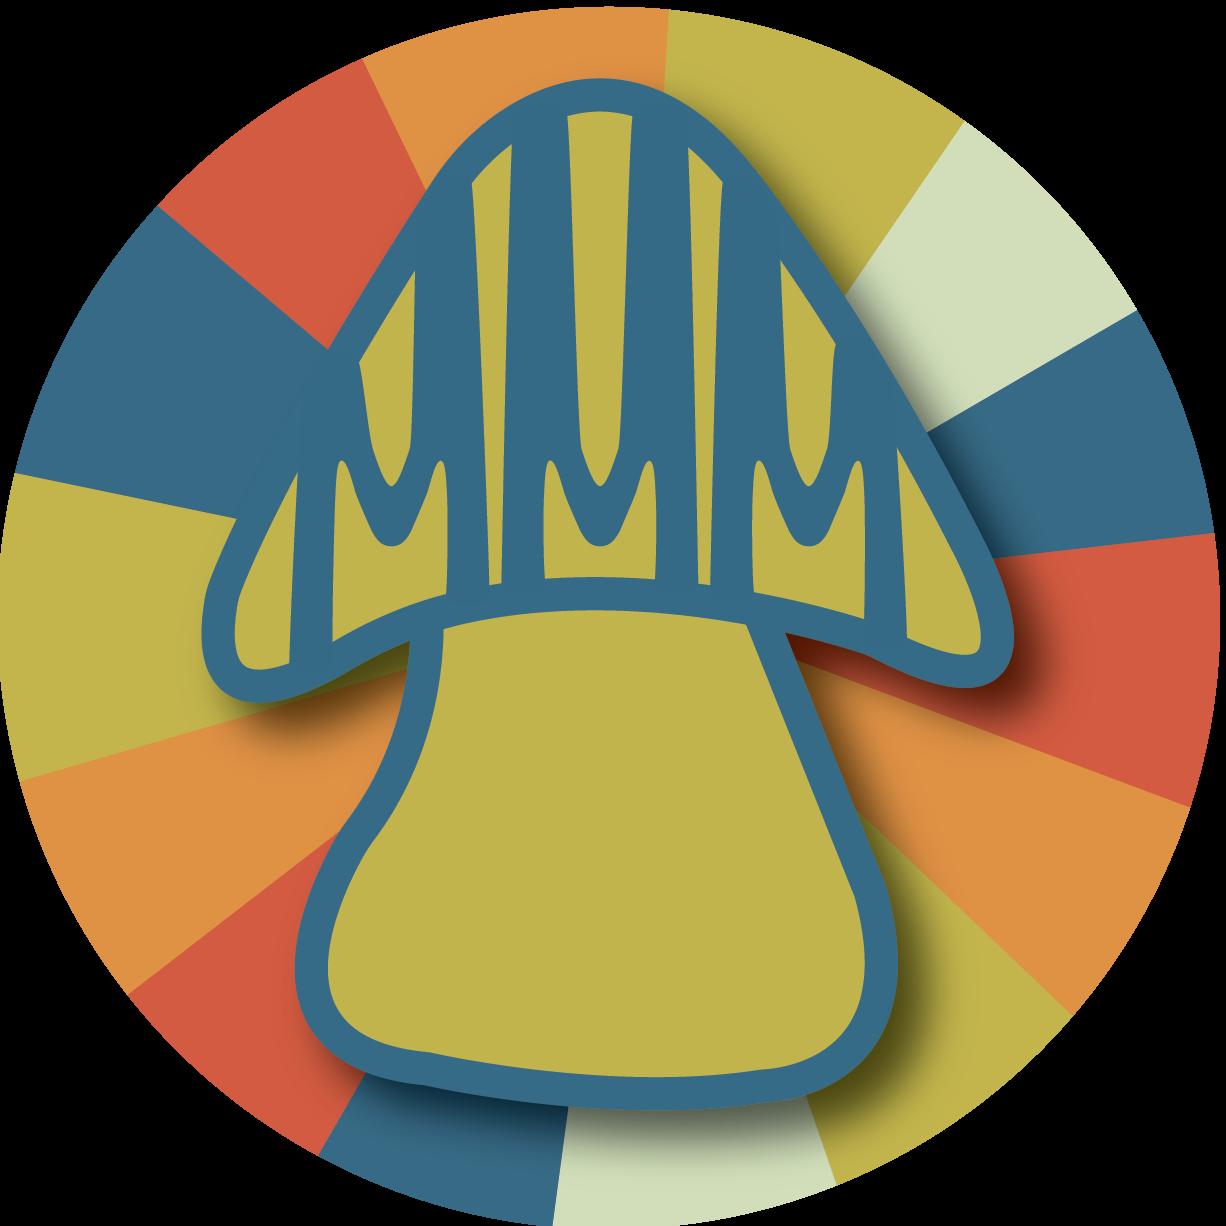 MushroomMan Mycology